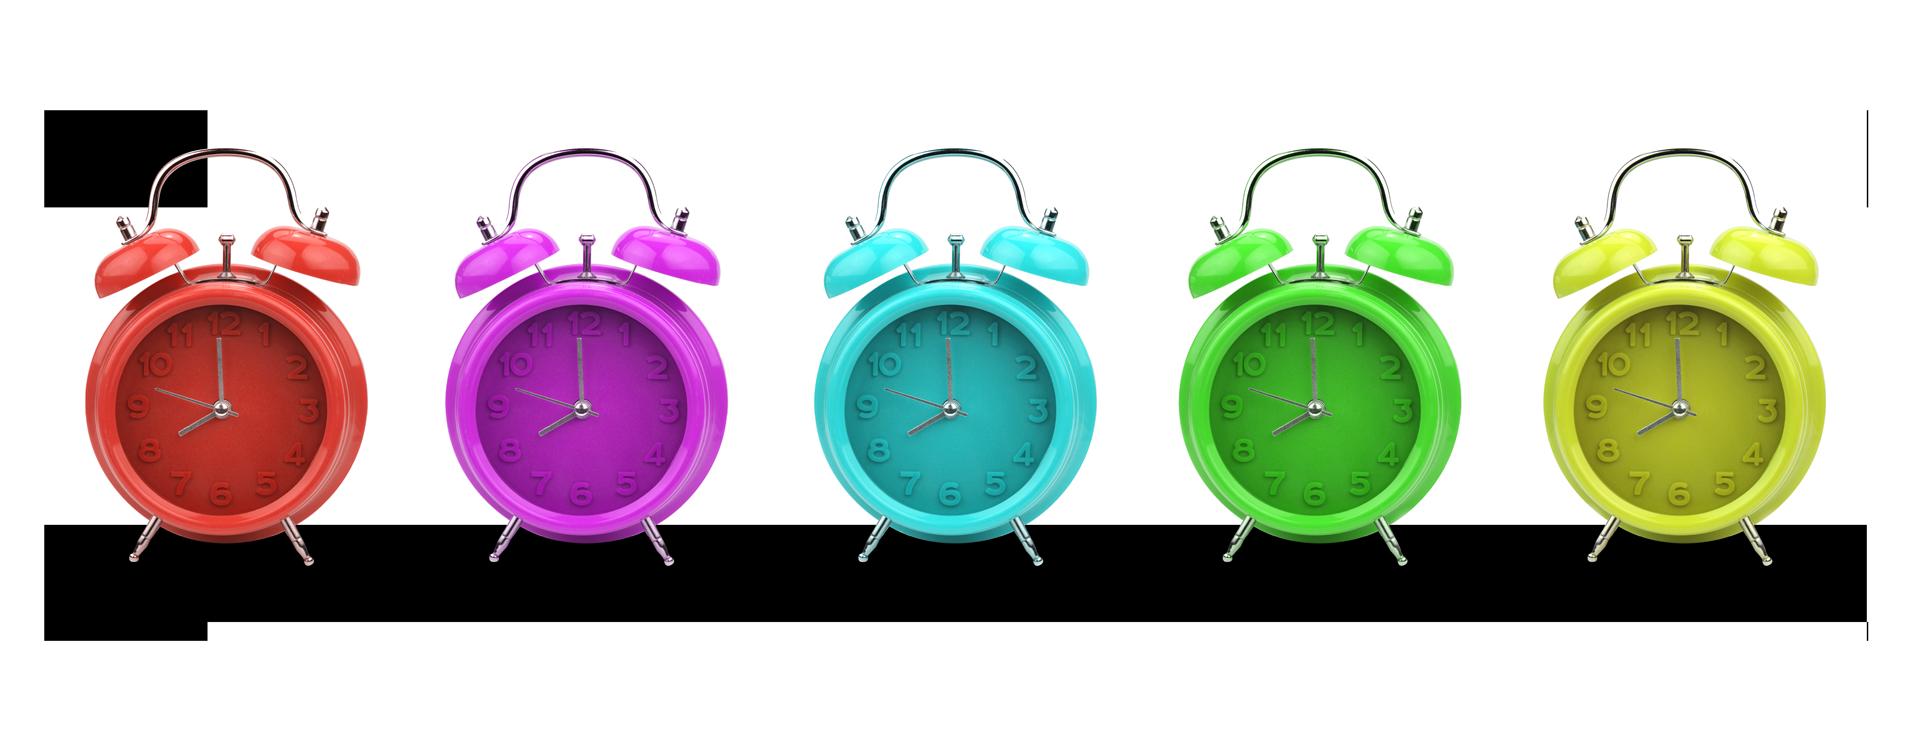 The Clocks Ticking